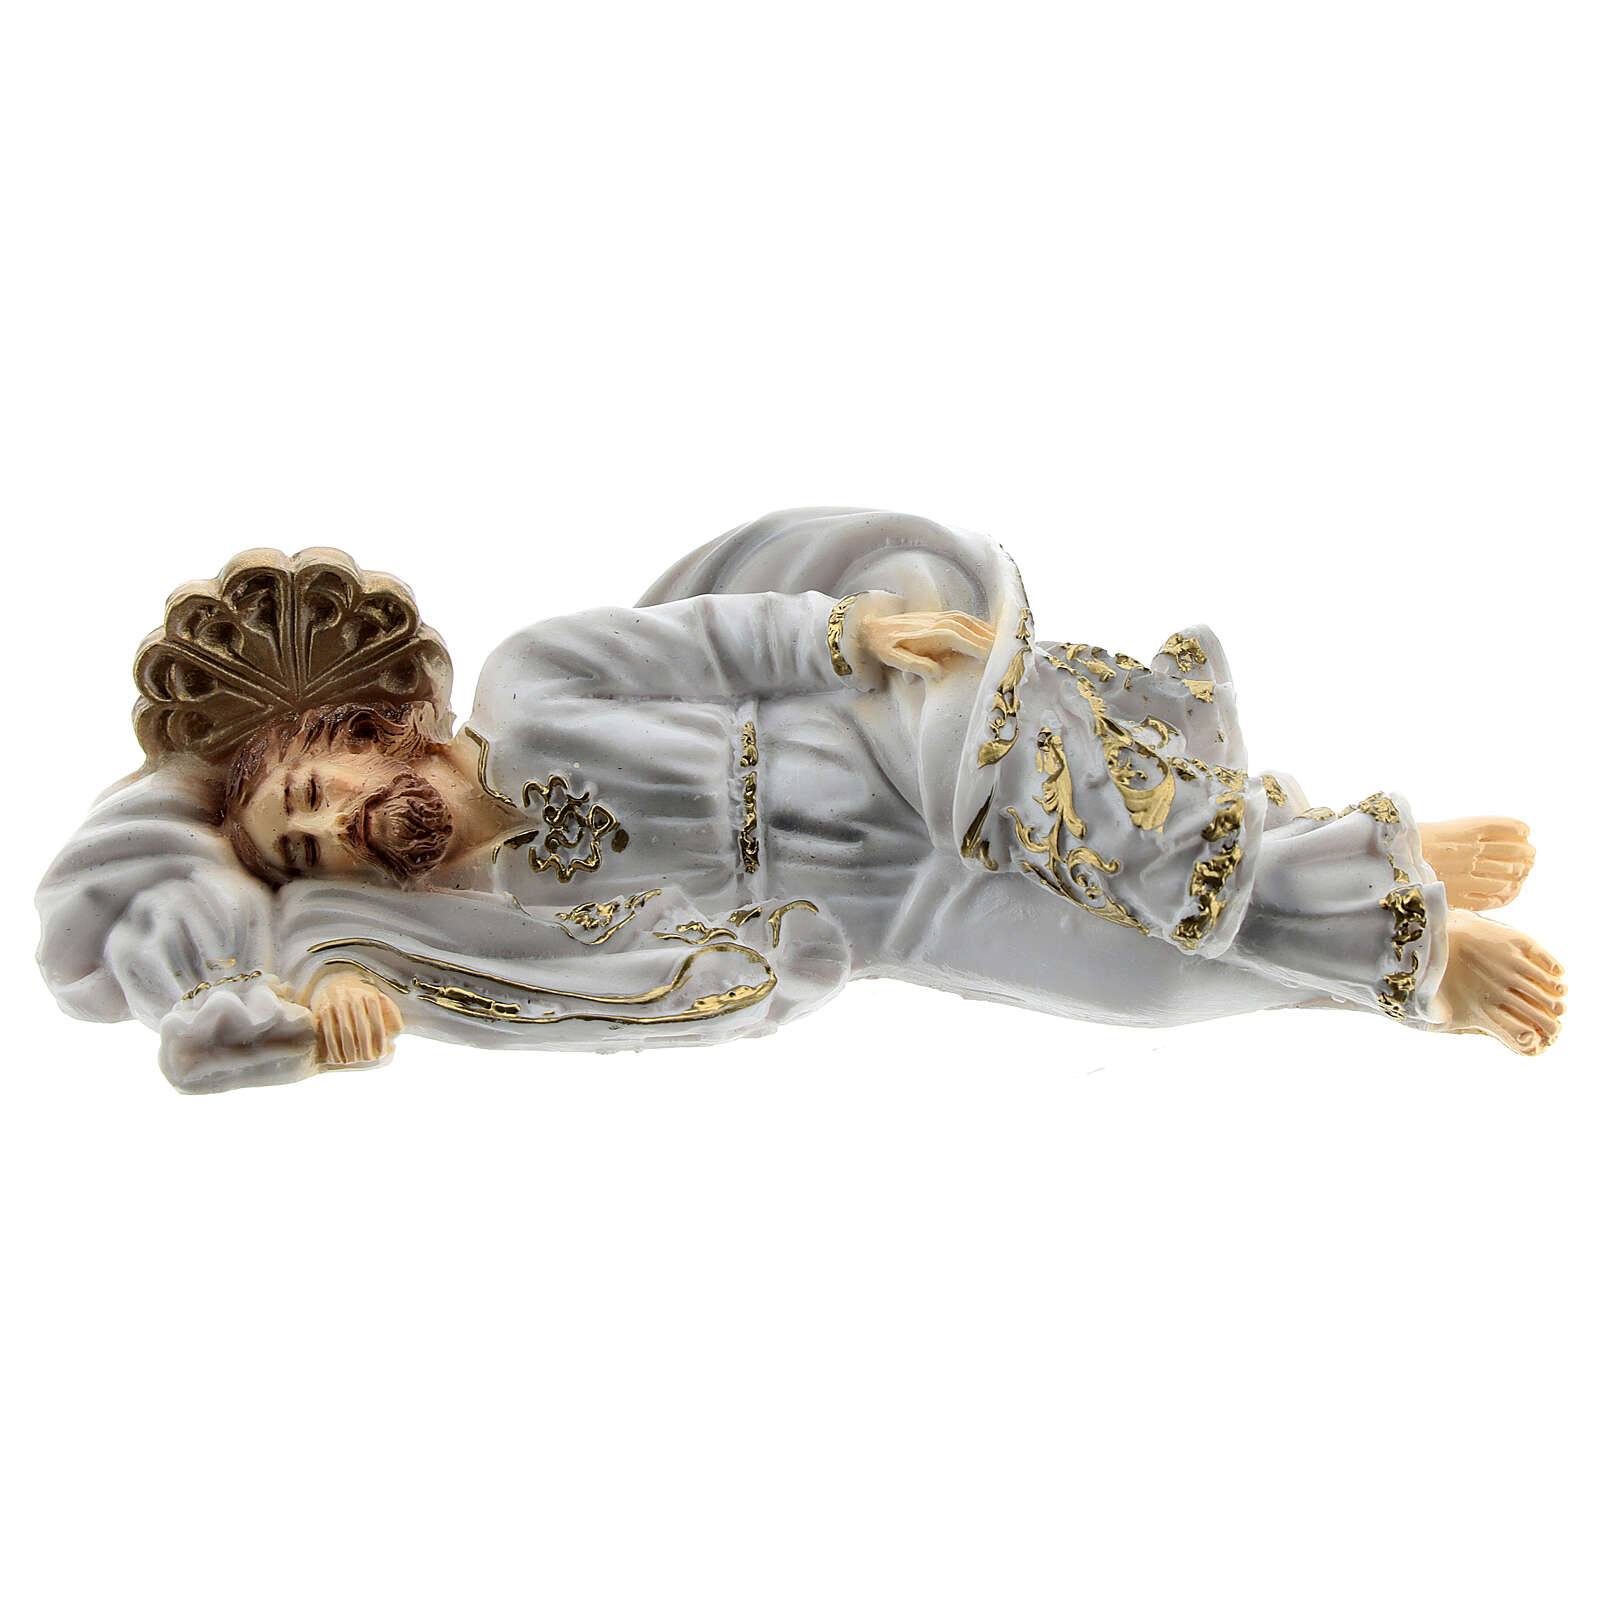 San Giuseppe dormiente veste bianca polvere di marmo 12 cm 4